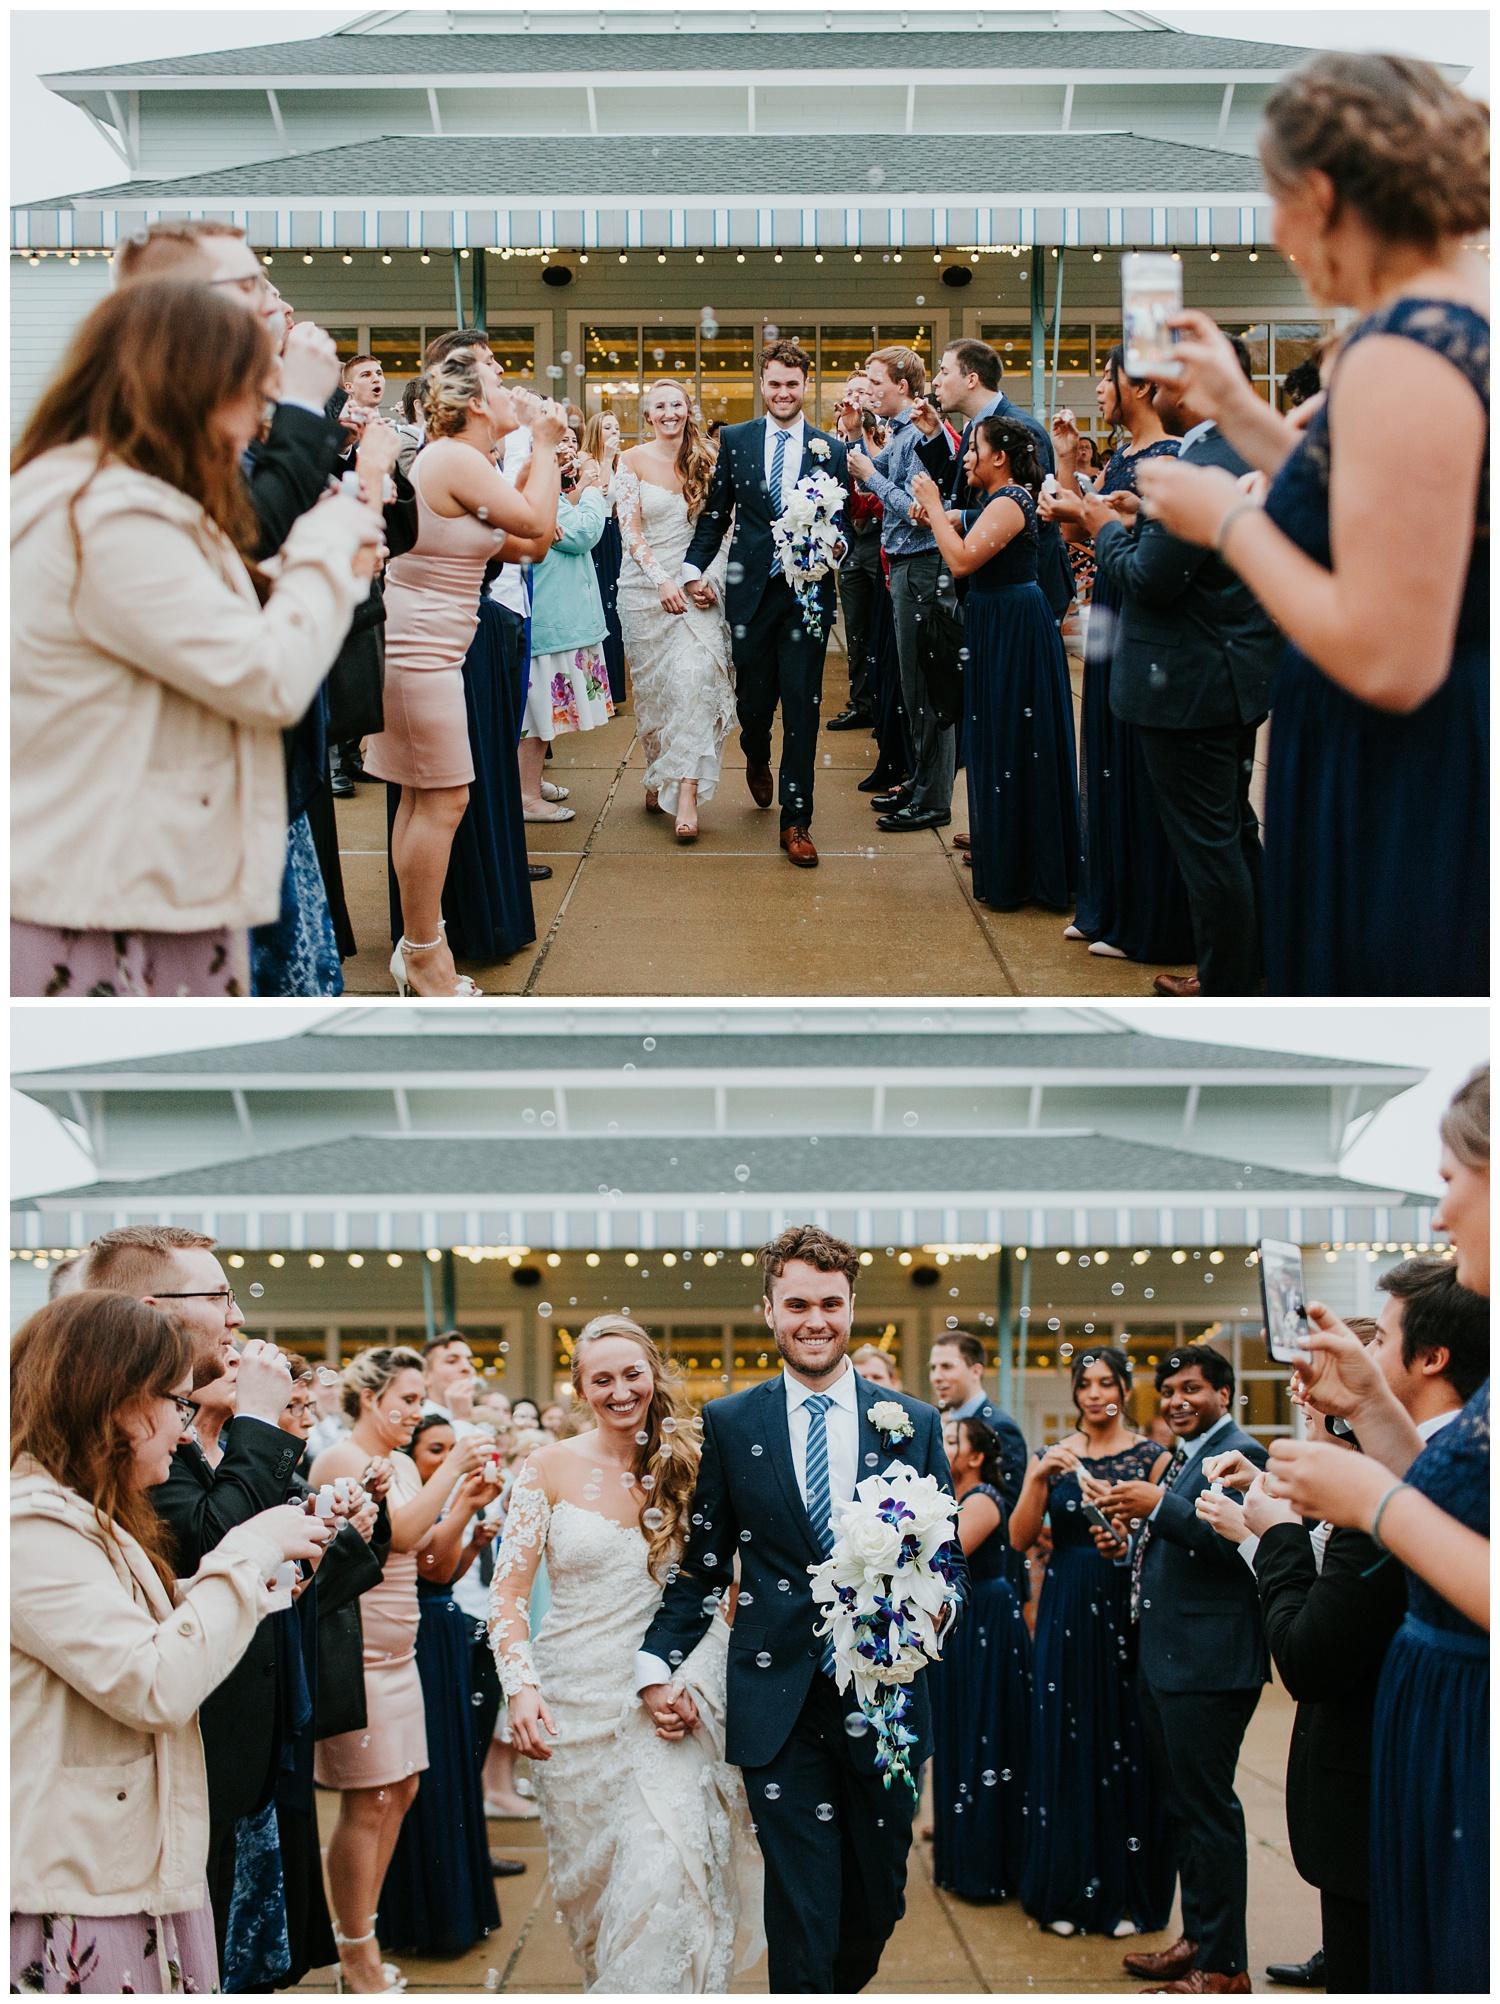 Shadowland Silver Beach St. Joseph Wedding Photographer Rainy Wedding58.jpg